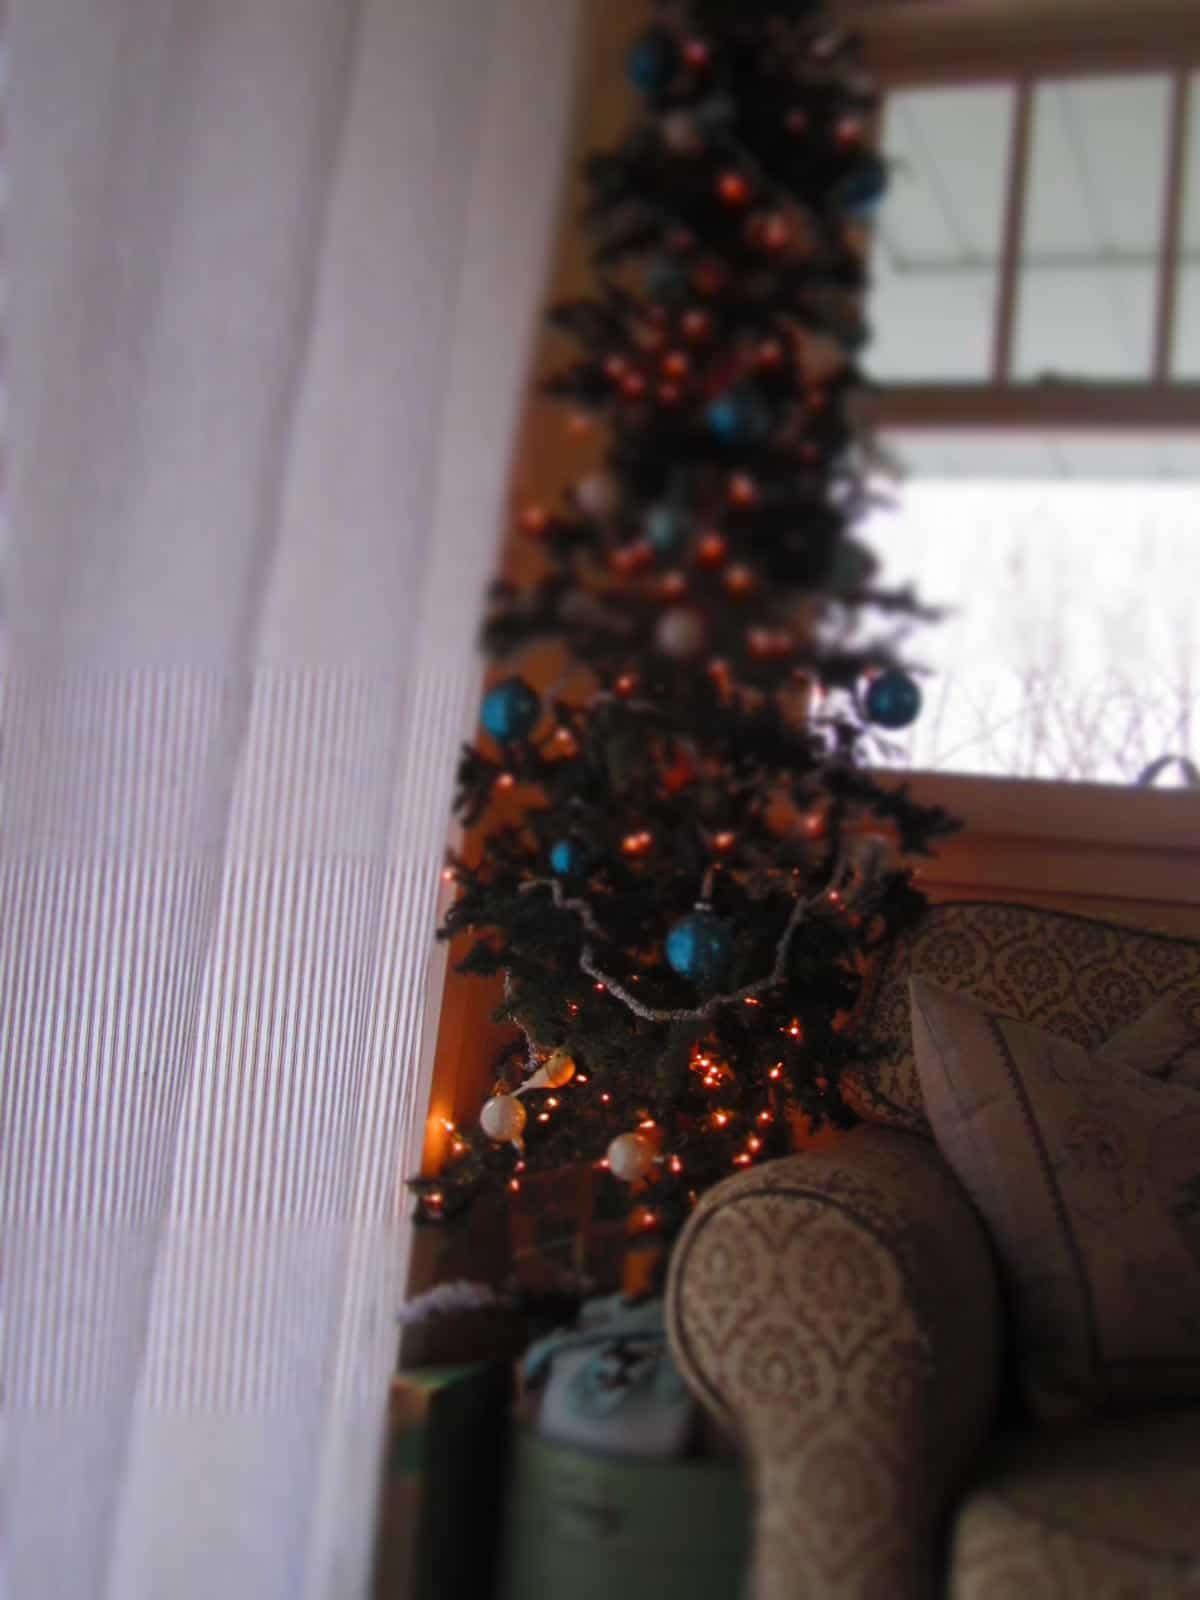 Shiny Brite ornaments on tree